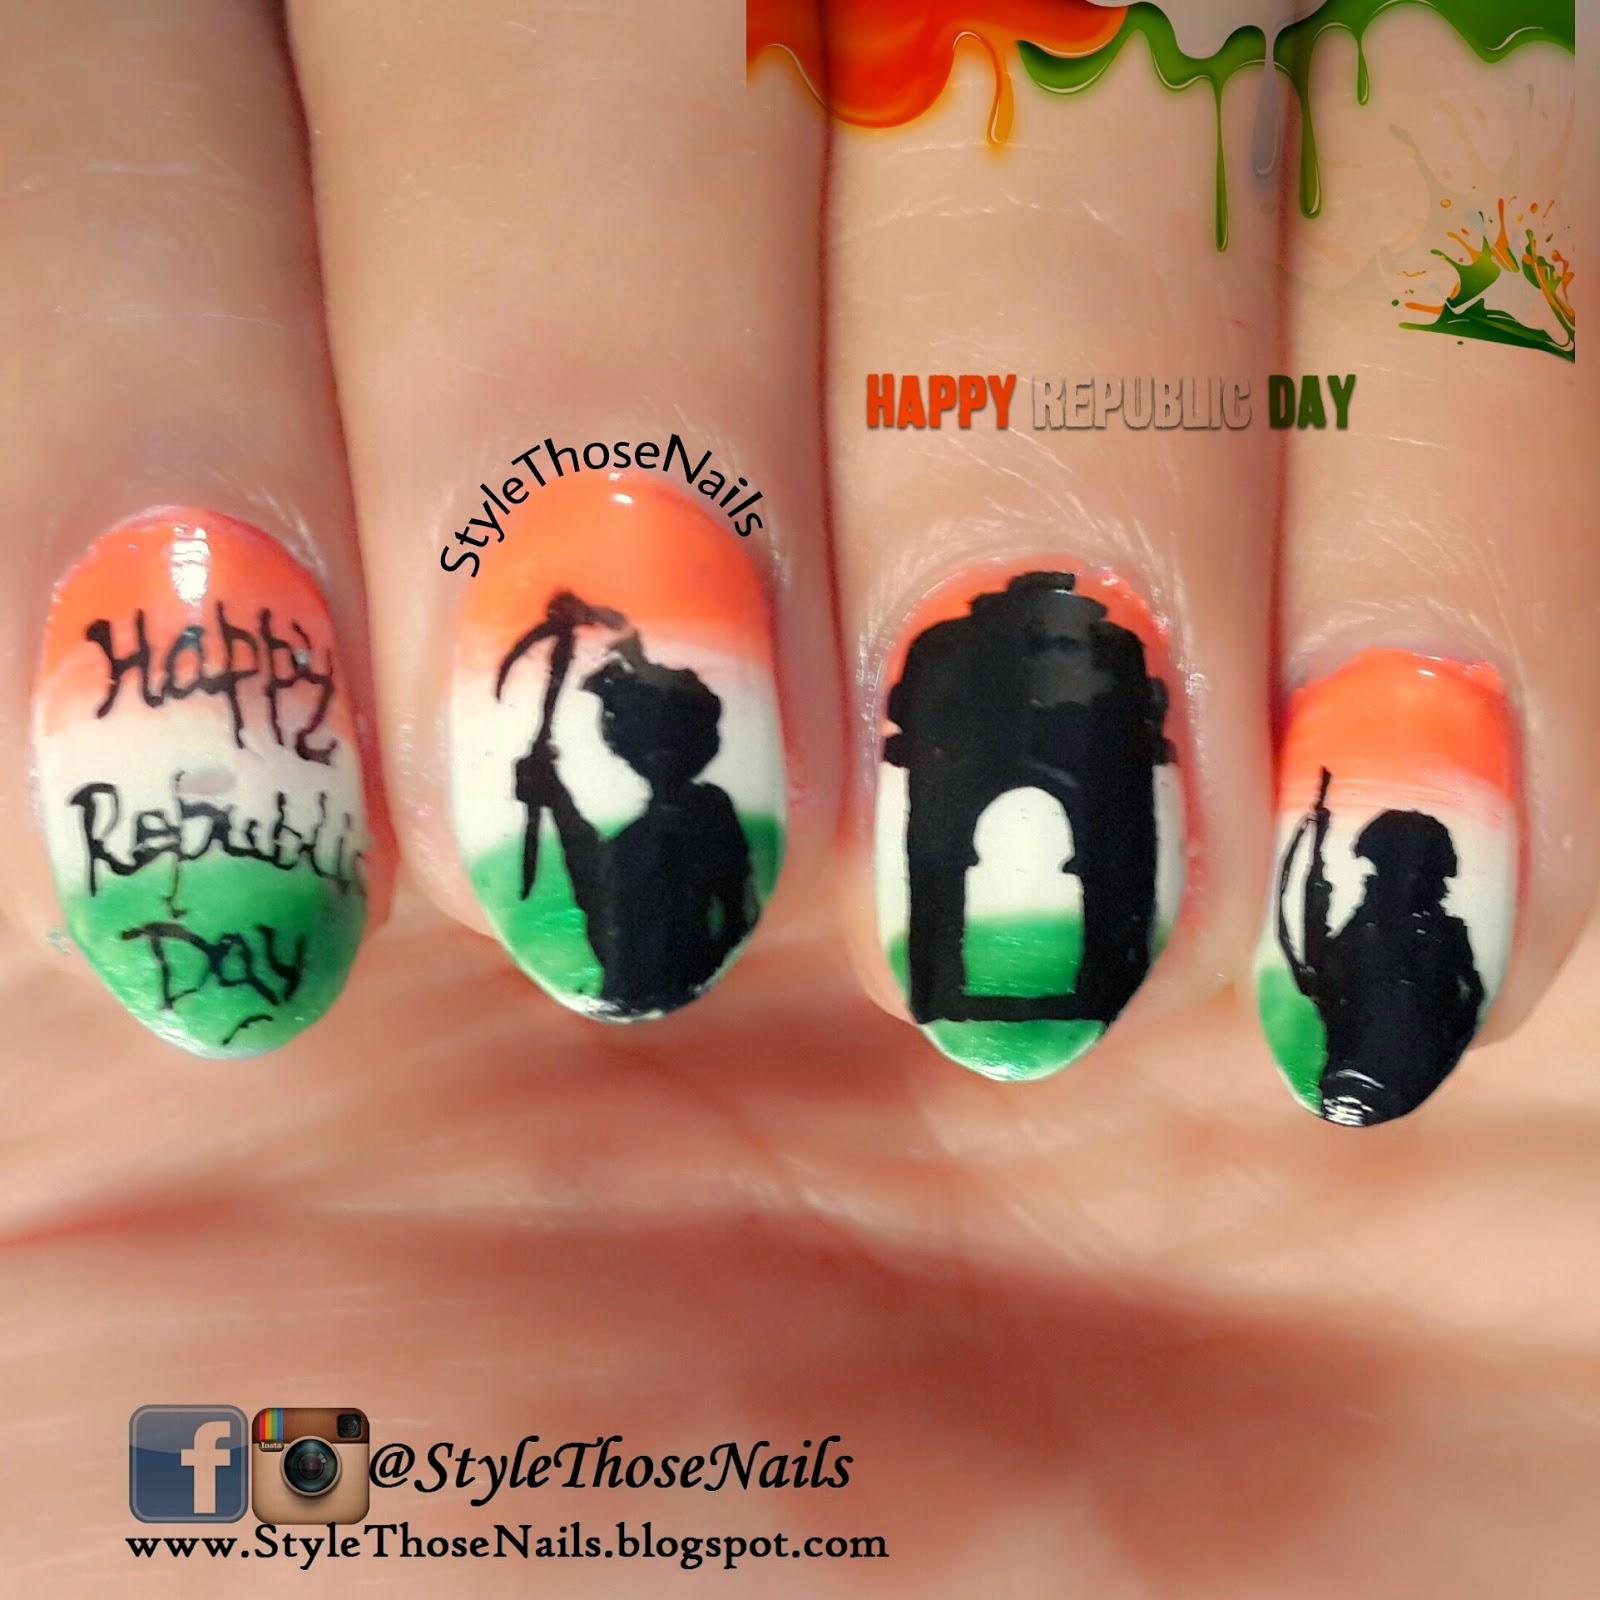 Style Those Nails: Indian Republic Day- 26 January 2015 Nailart